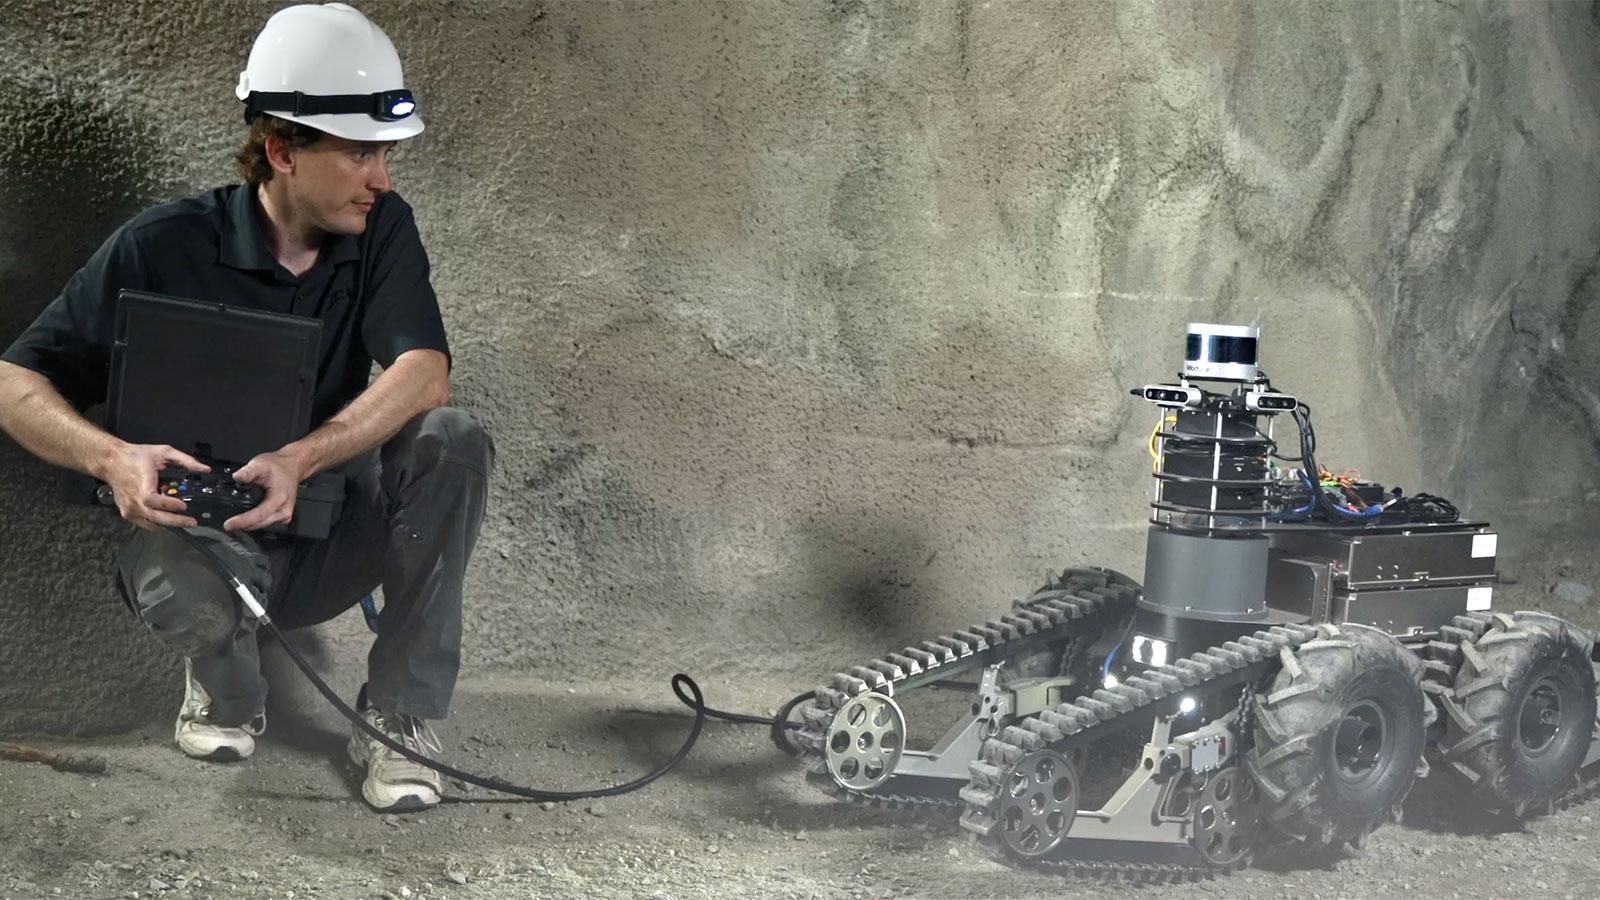 DARPA Combat Robots | SubTerranean Challenge – Autonomous Robots in Caves and Underground Passages